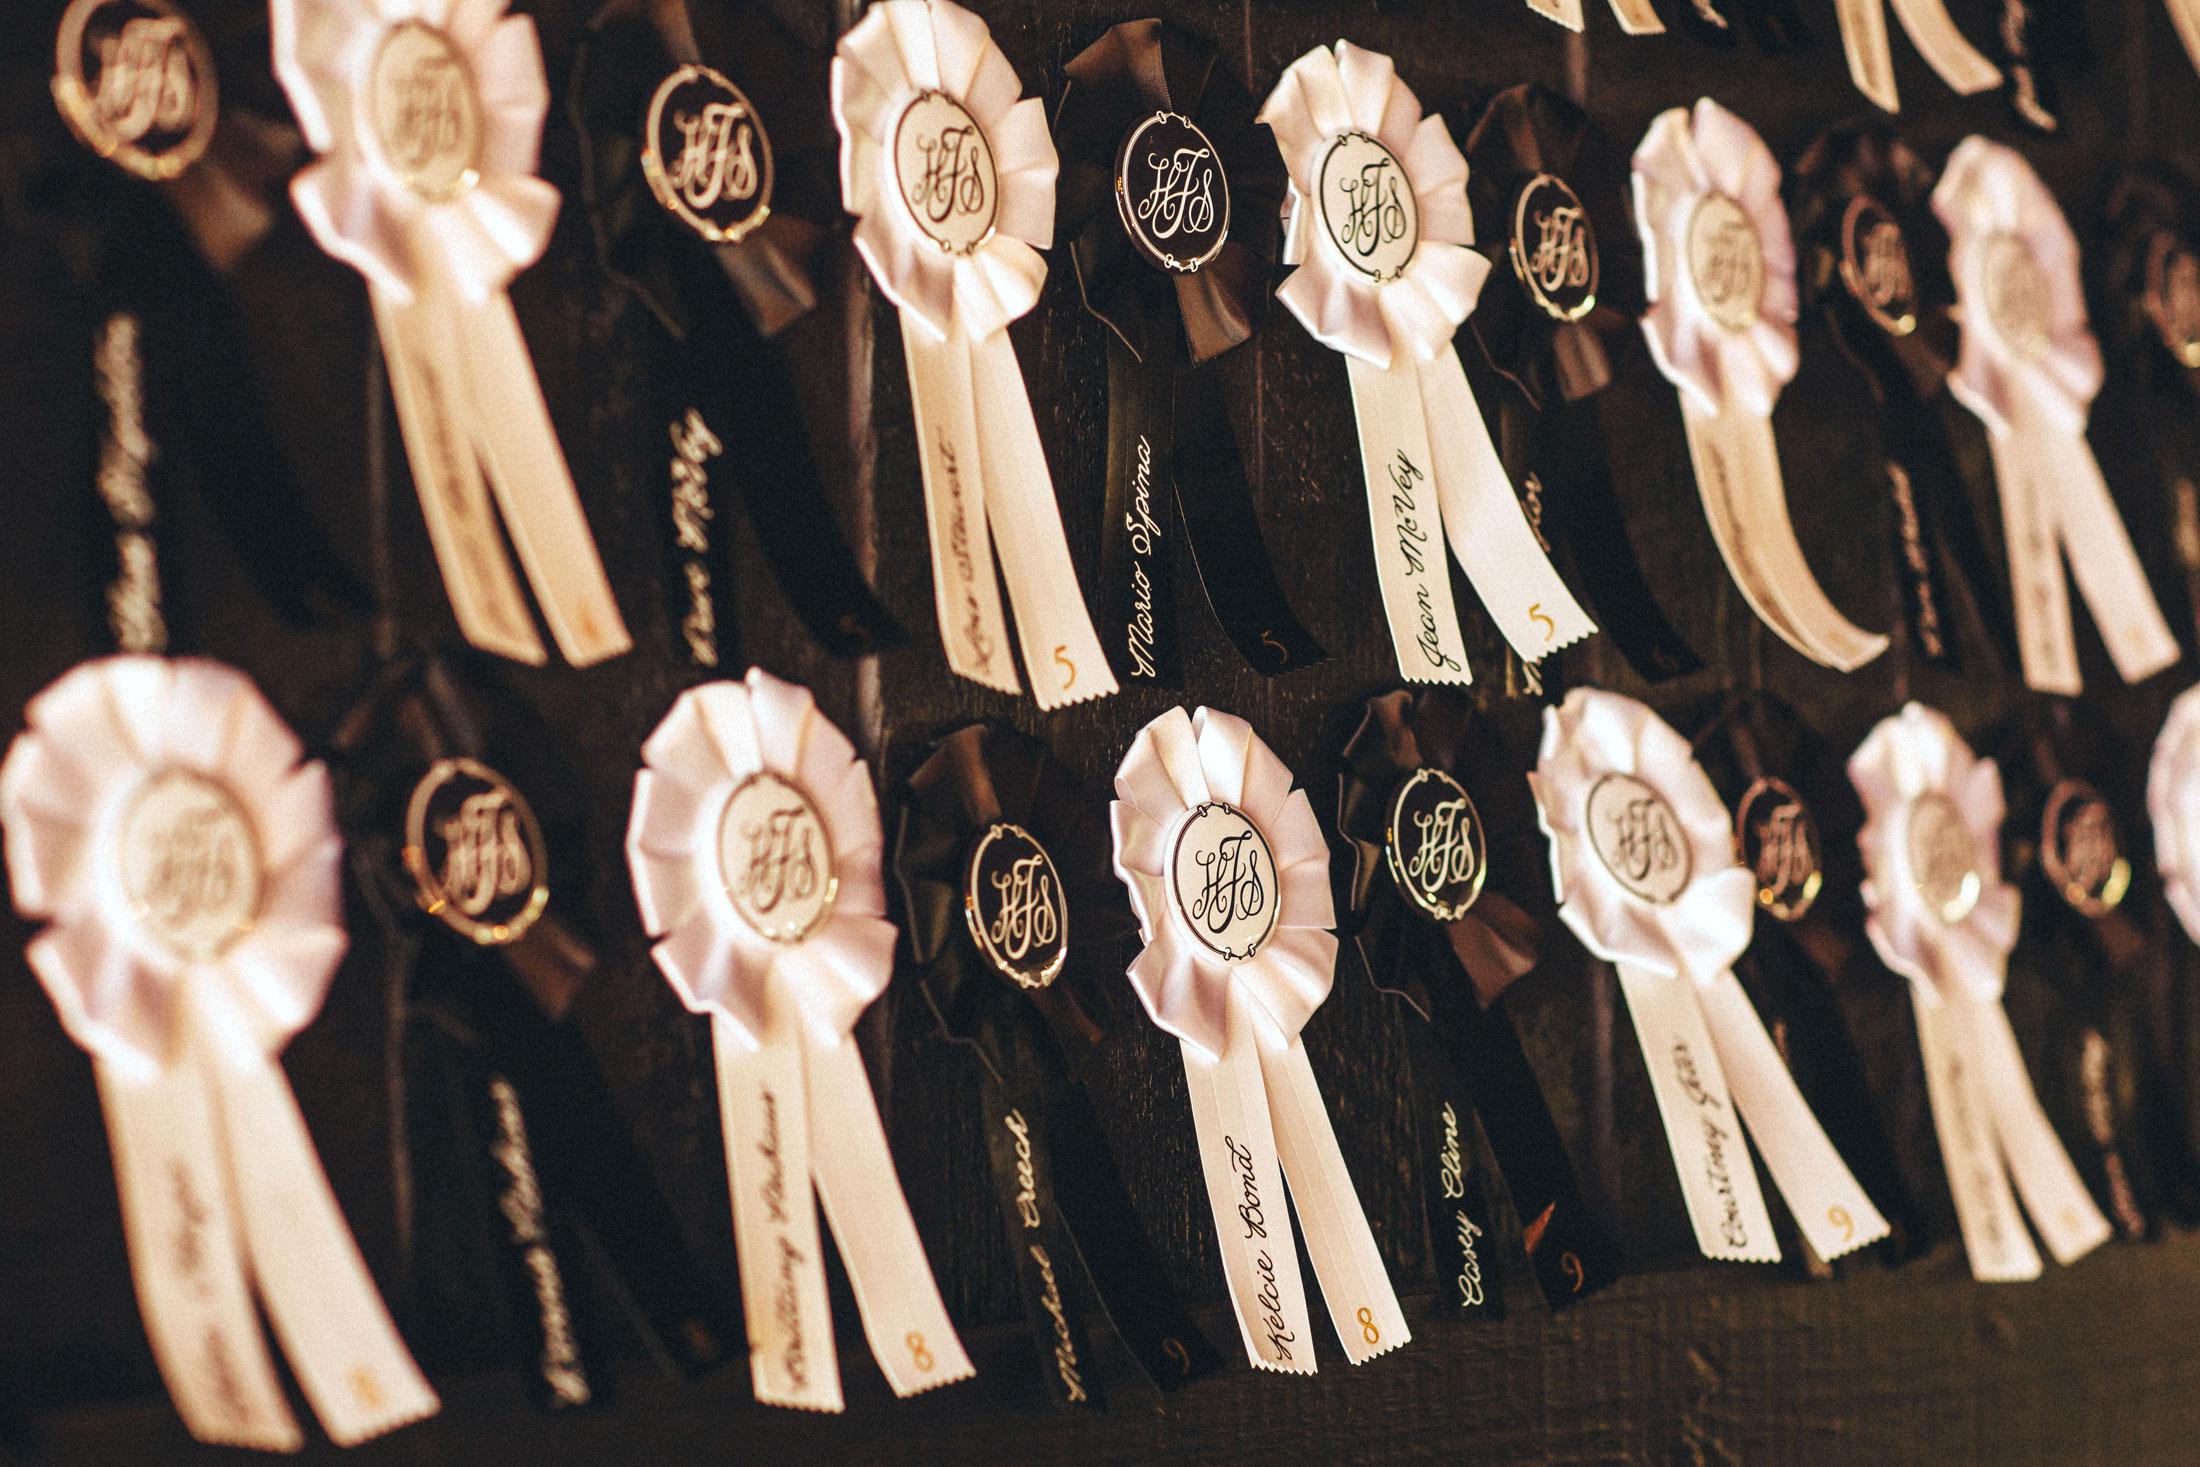 Me & Mr. Jones Wedding, DIY Rosette Escort Cards, Equestrian Themed Wedding Decor, Kentucky Derby Inspired Wedding Decor, Rustic Glam Wedding